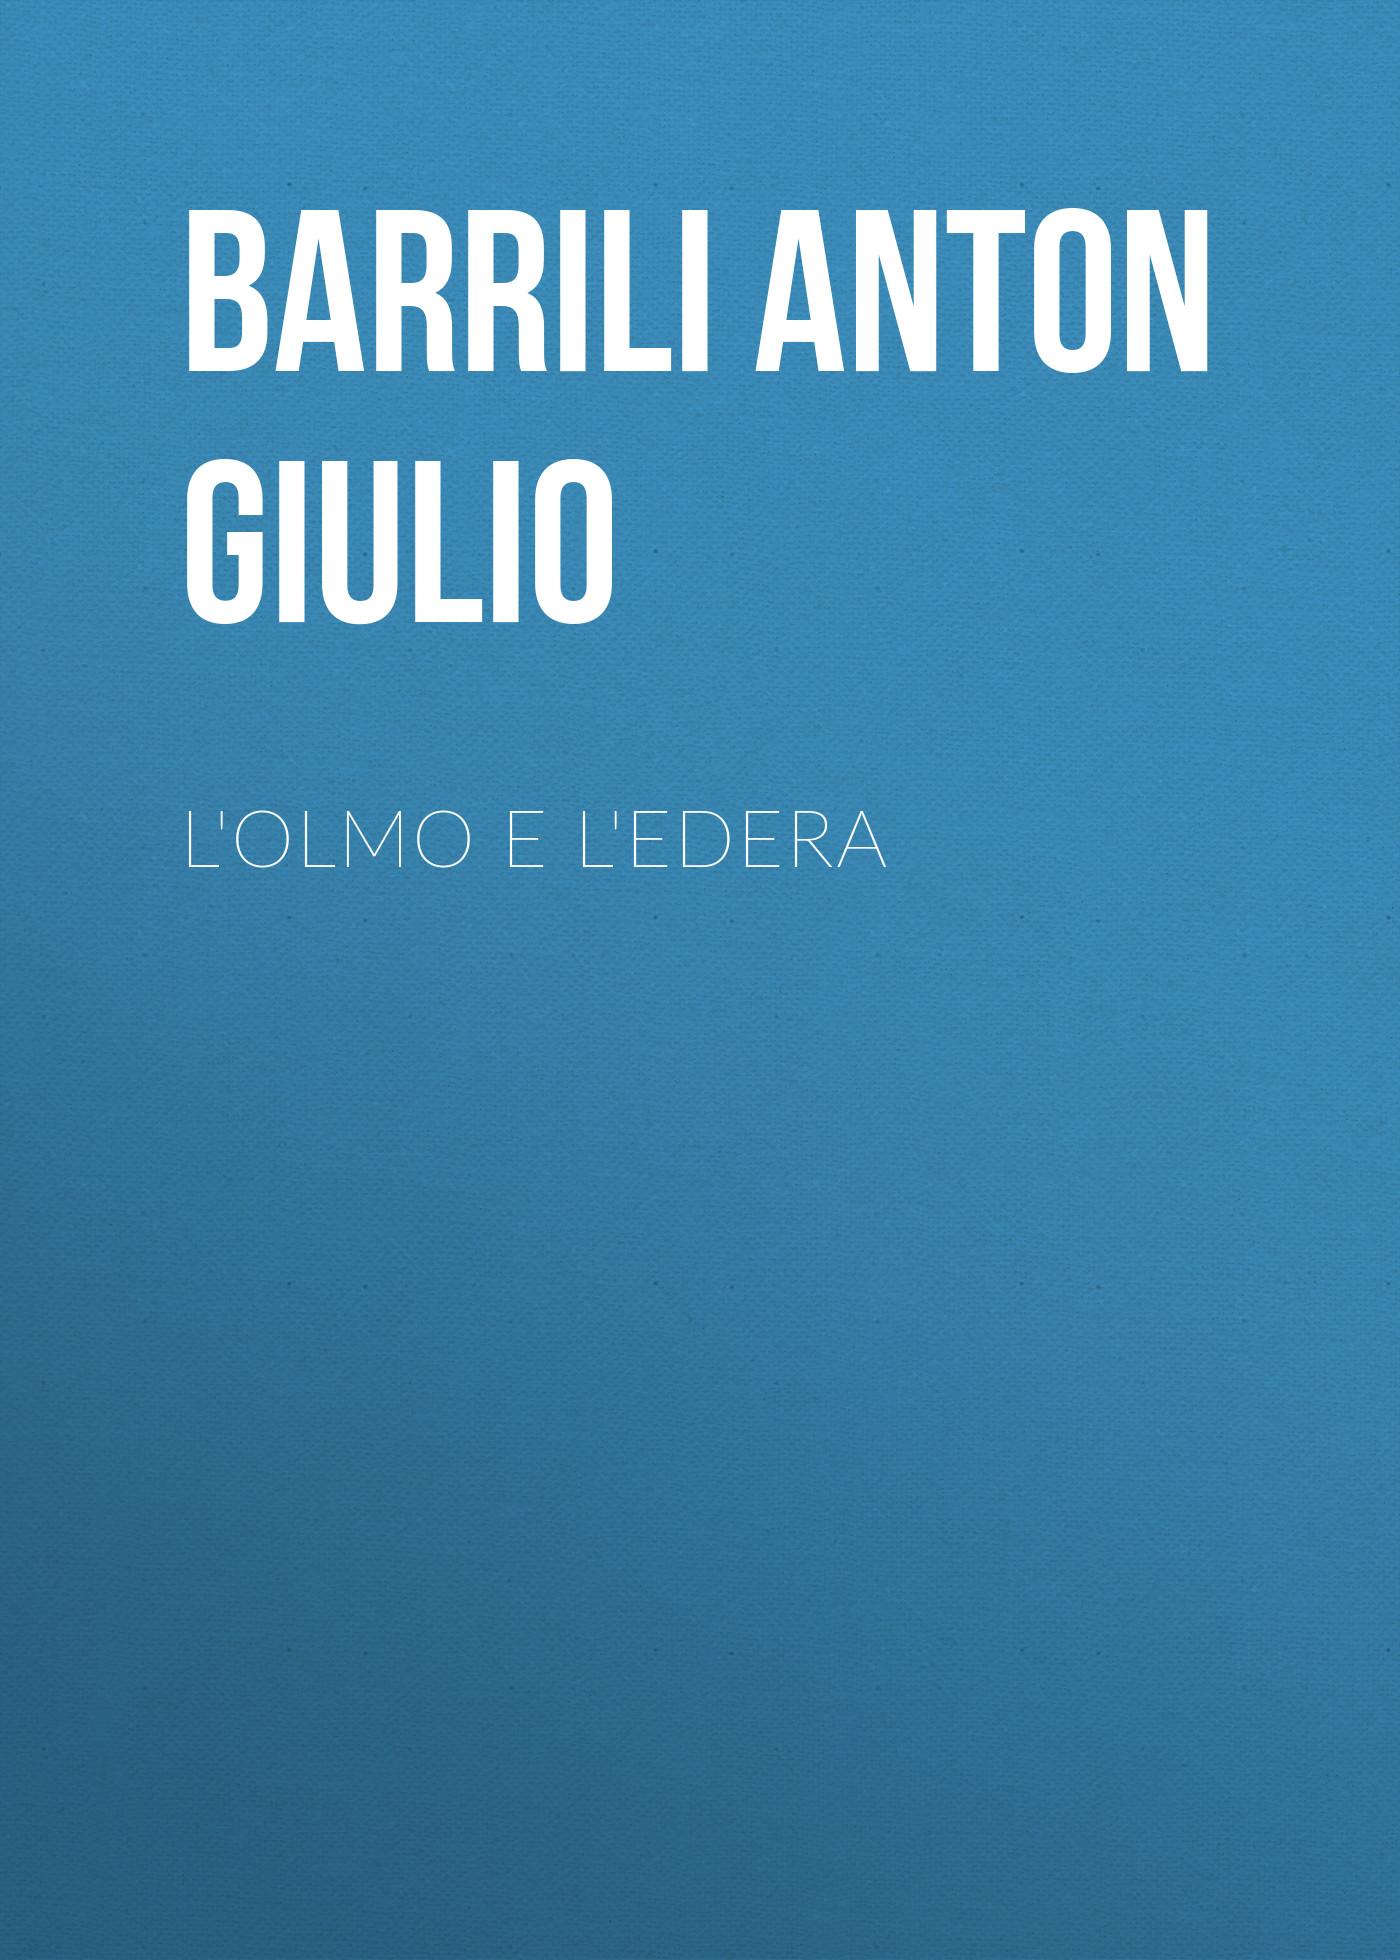 Barrili Anton Giulio L'olmo e l'edera new original 18 npn input 14 transistor output xcc 32t e plc